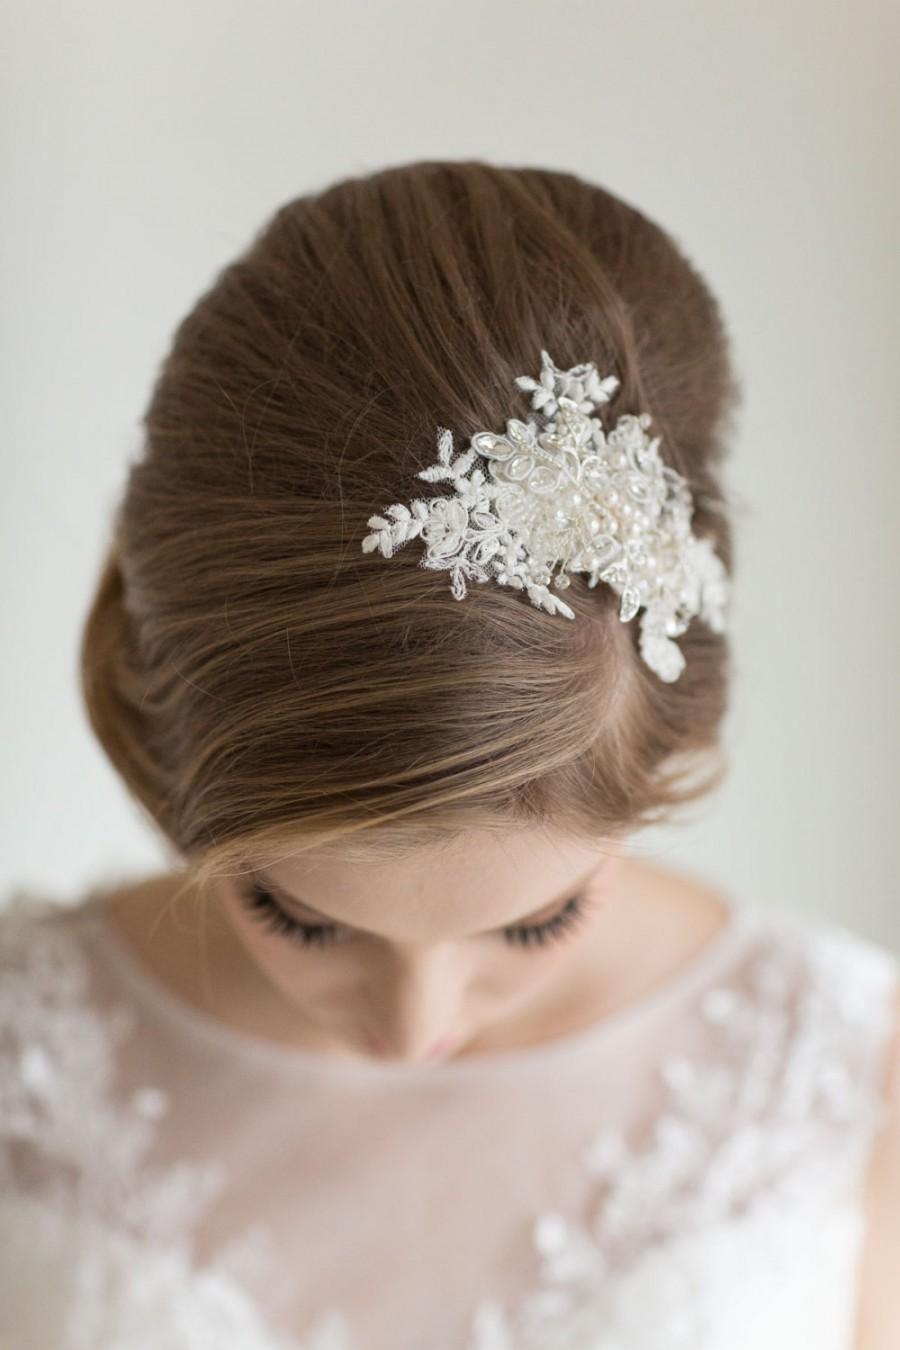 Свадьба - Bridal Lace Hair Comb, Wedding Headpiece, Bridal Lace Fascinator, Ivory Beaded Comb